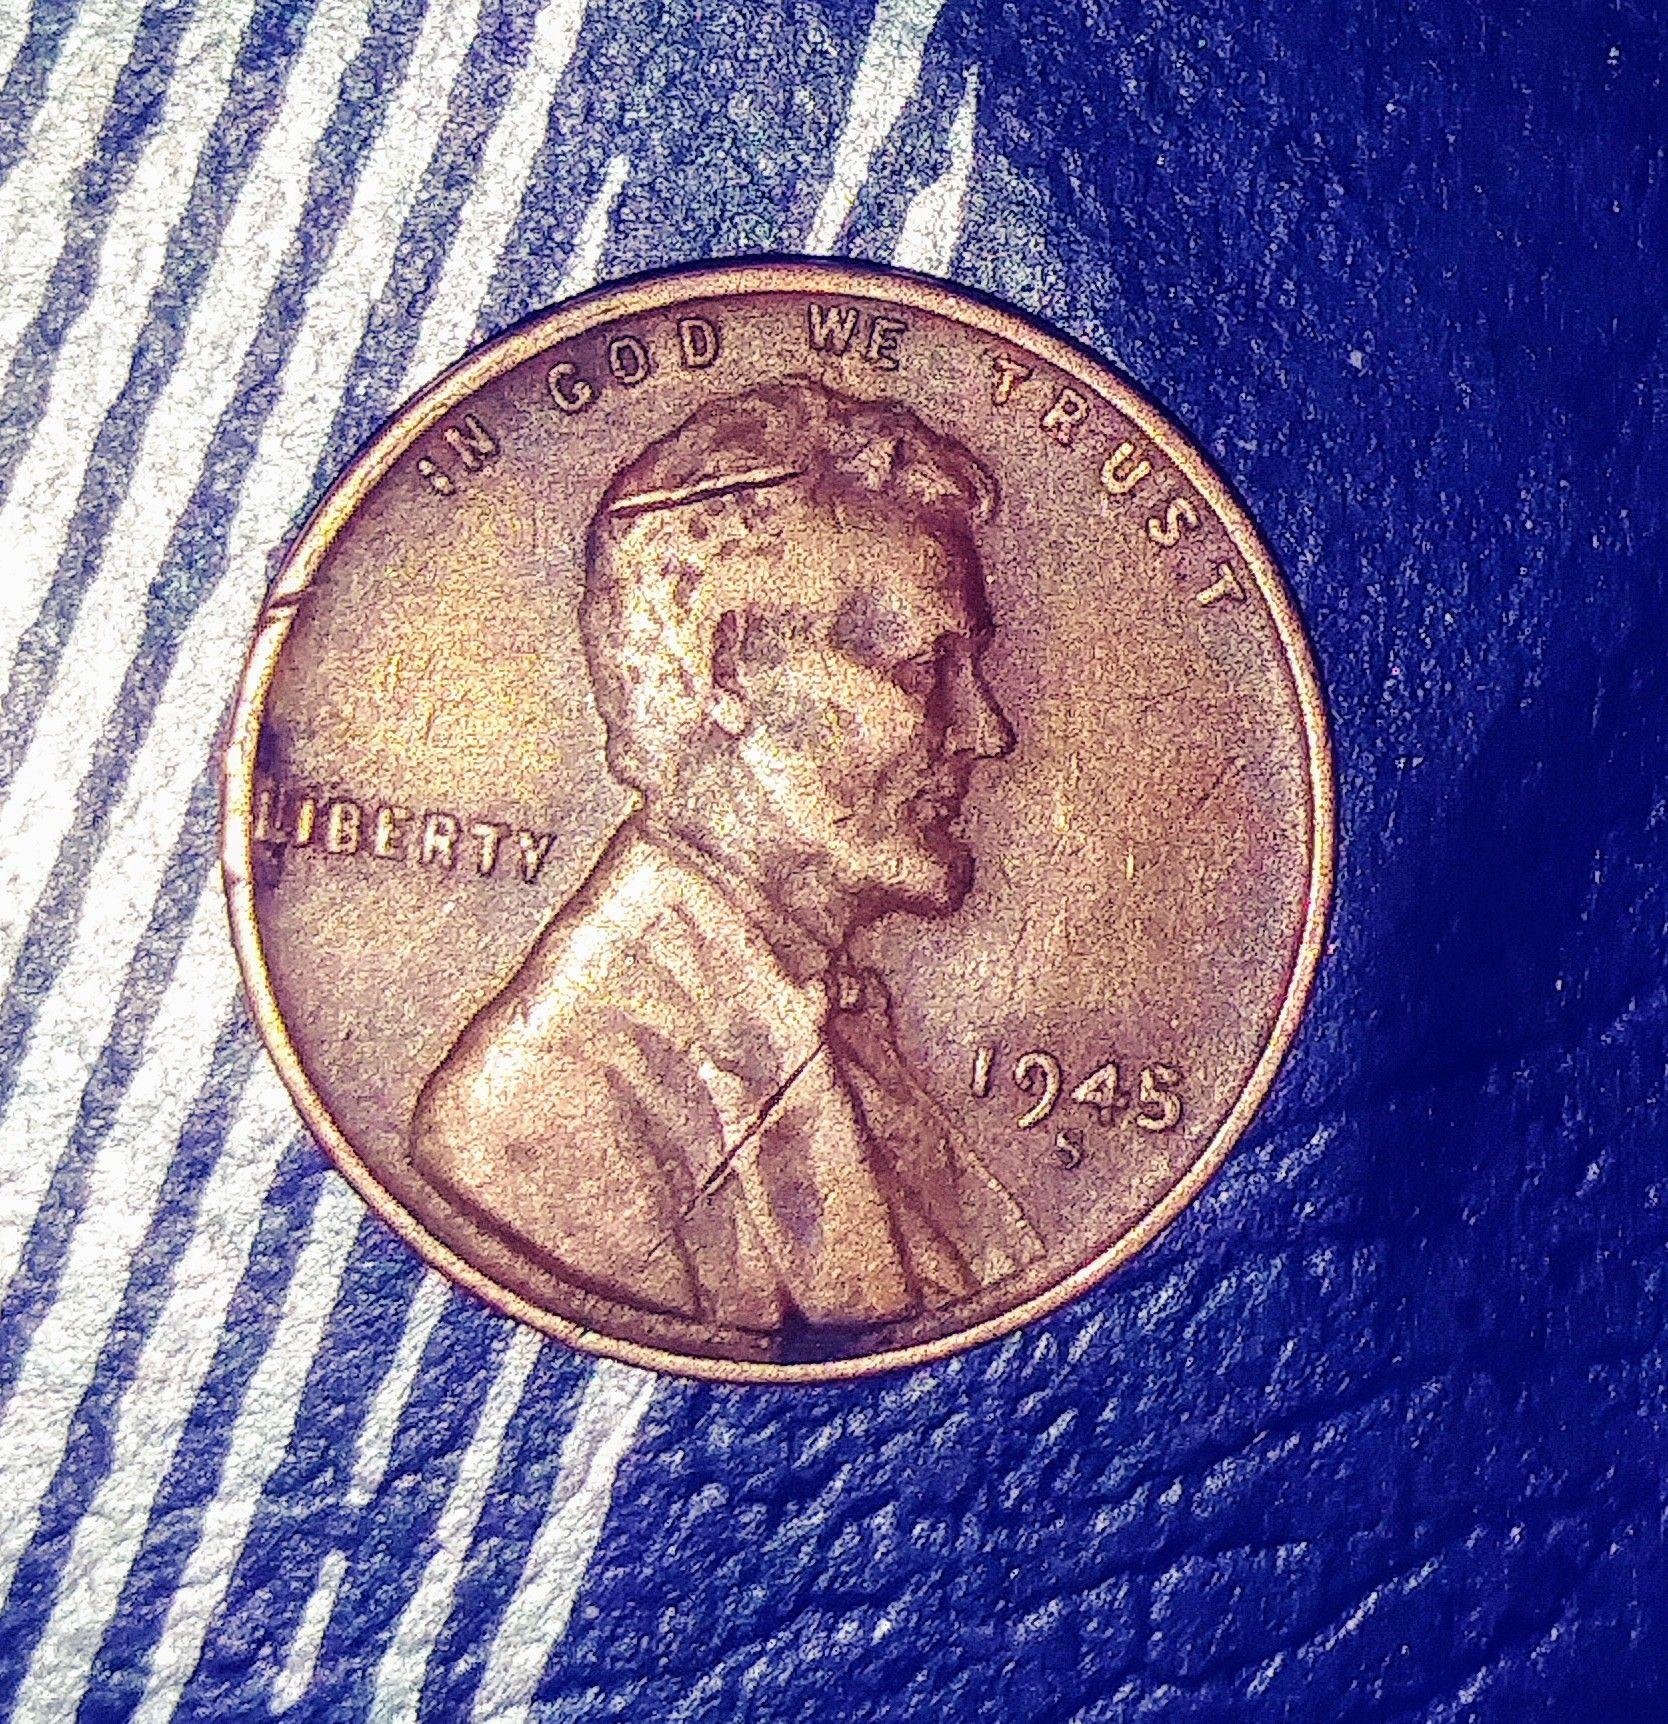 Sterling Wheat Penny Error See More Wheat Penny Error Picclick 1945